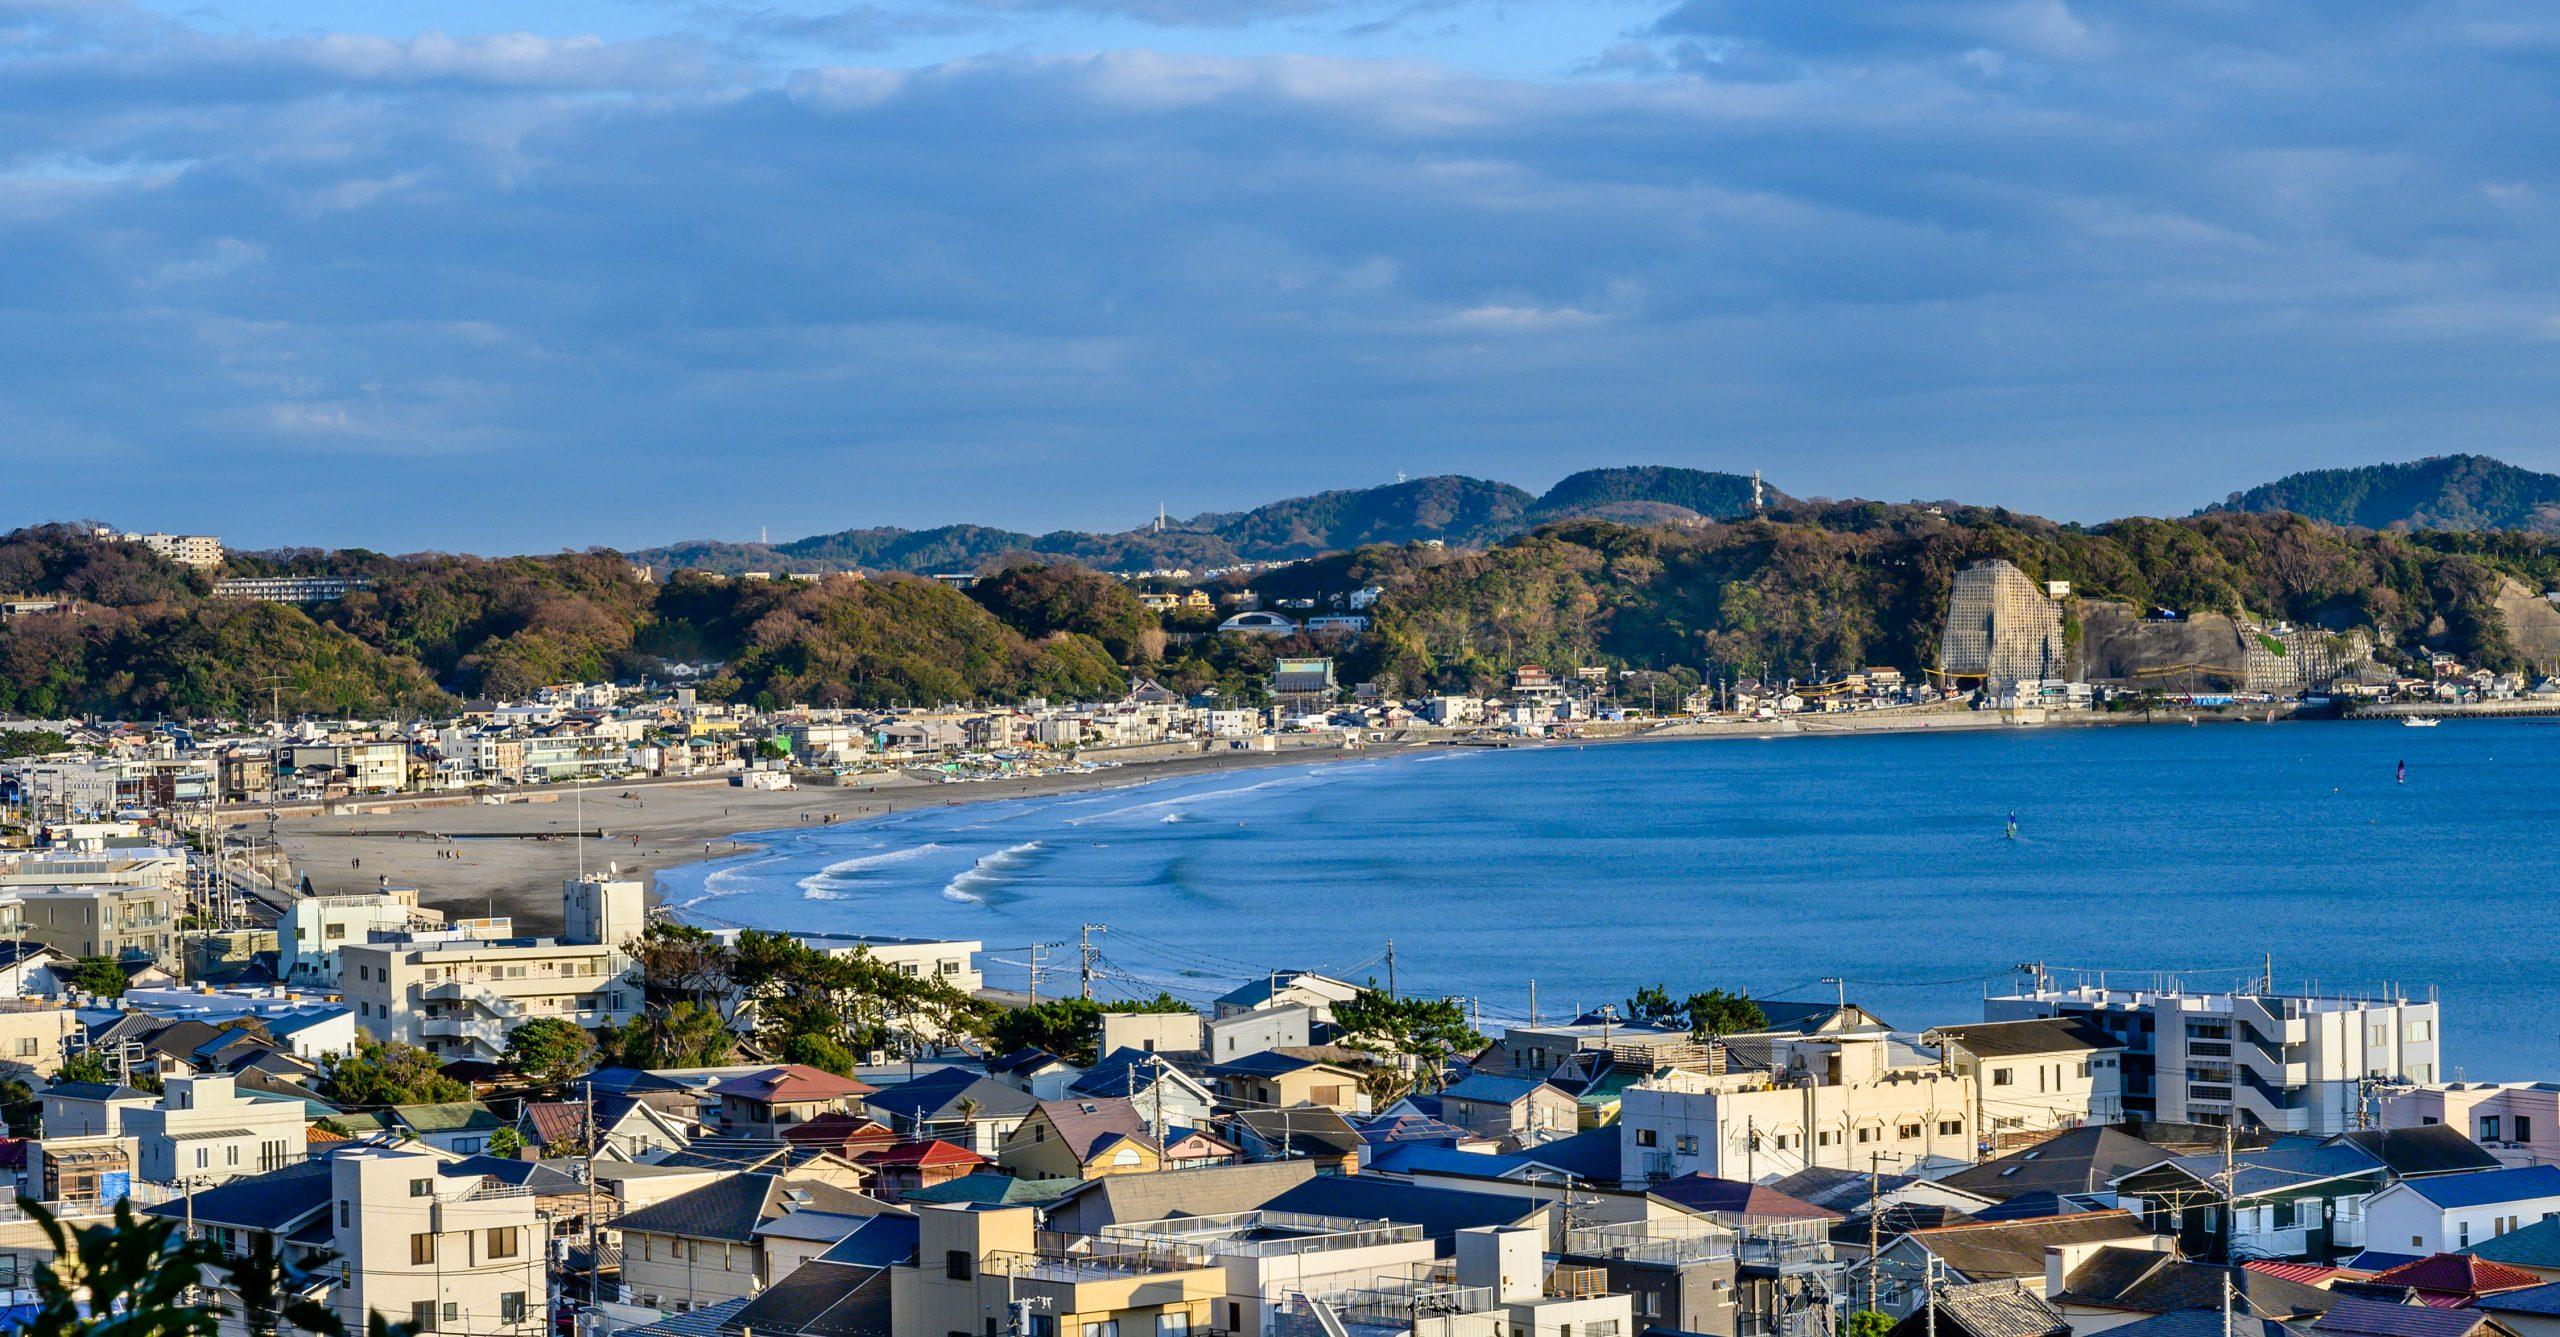 Visit The Seaside Town Of Kamakura On The Kamakura Walking Tour And Tea Ceremony